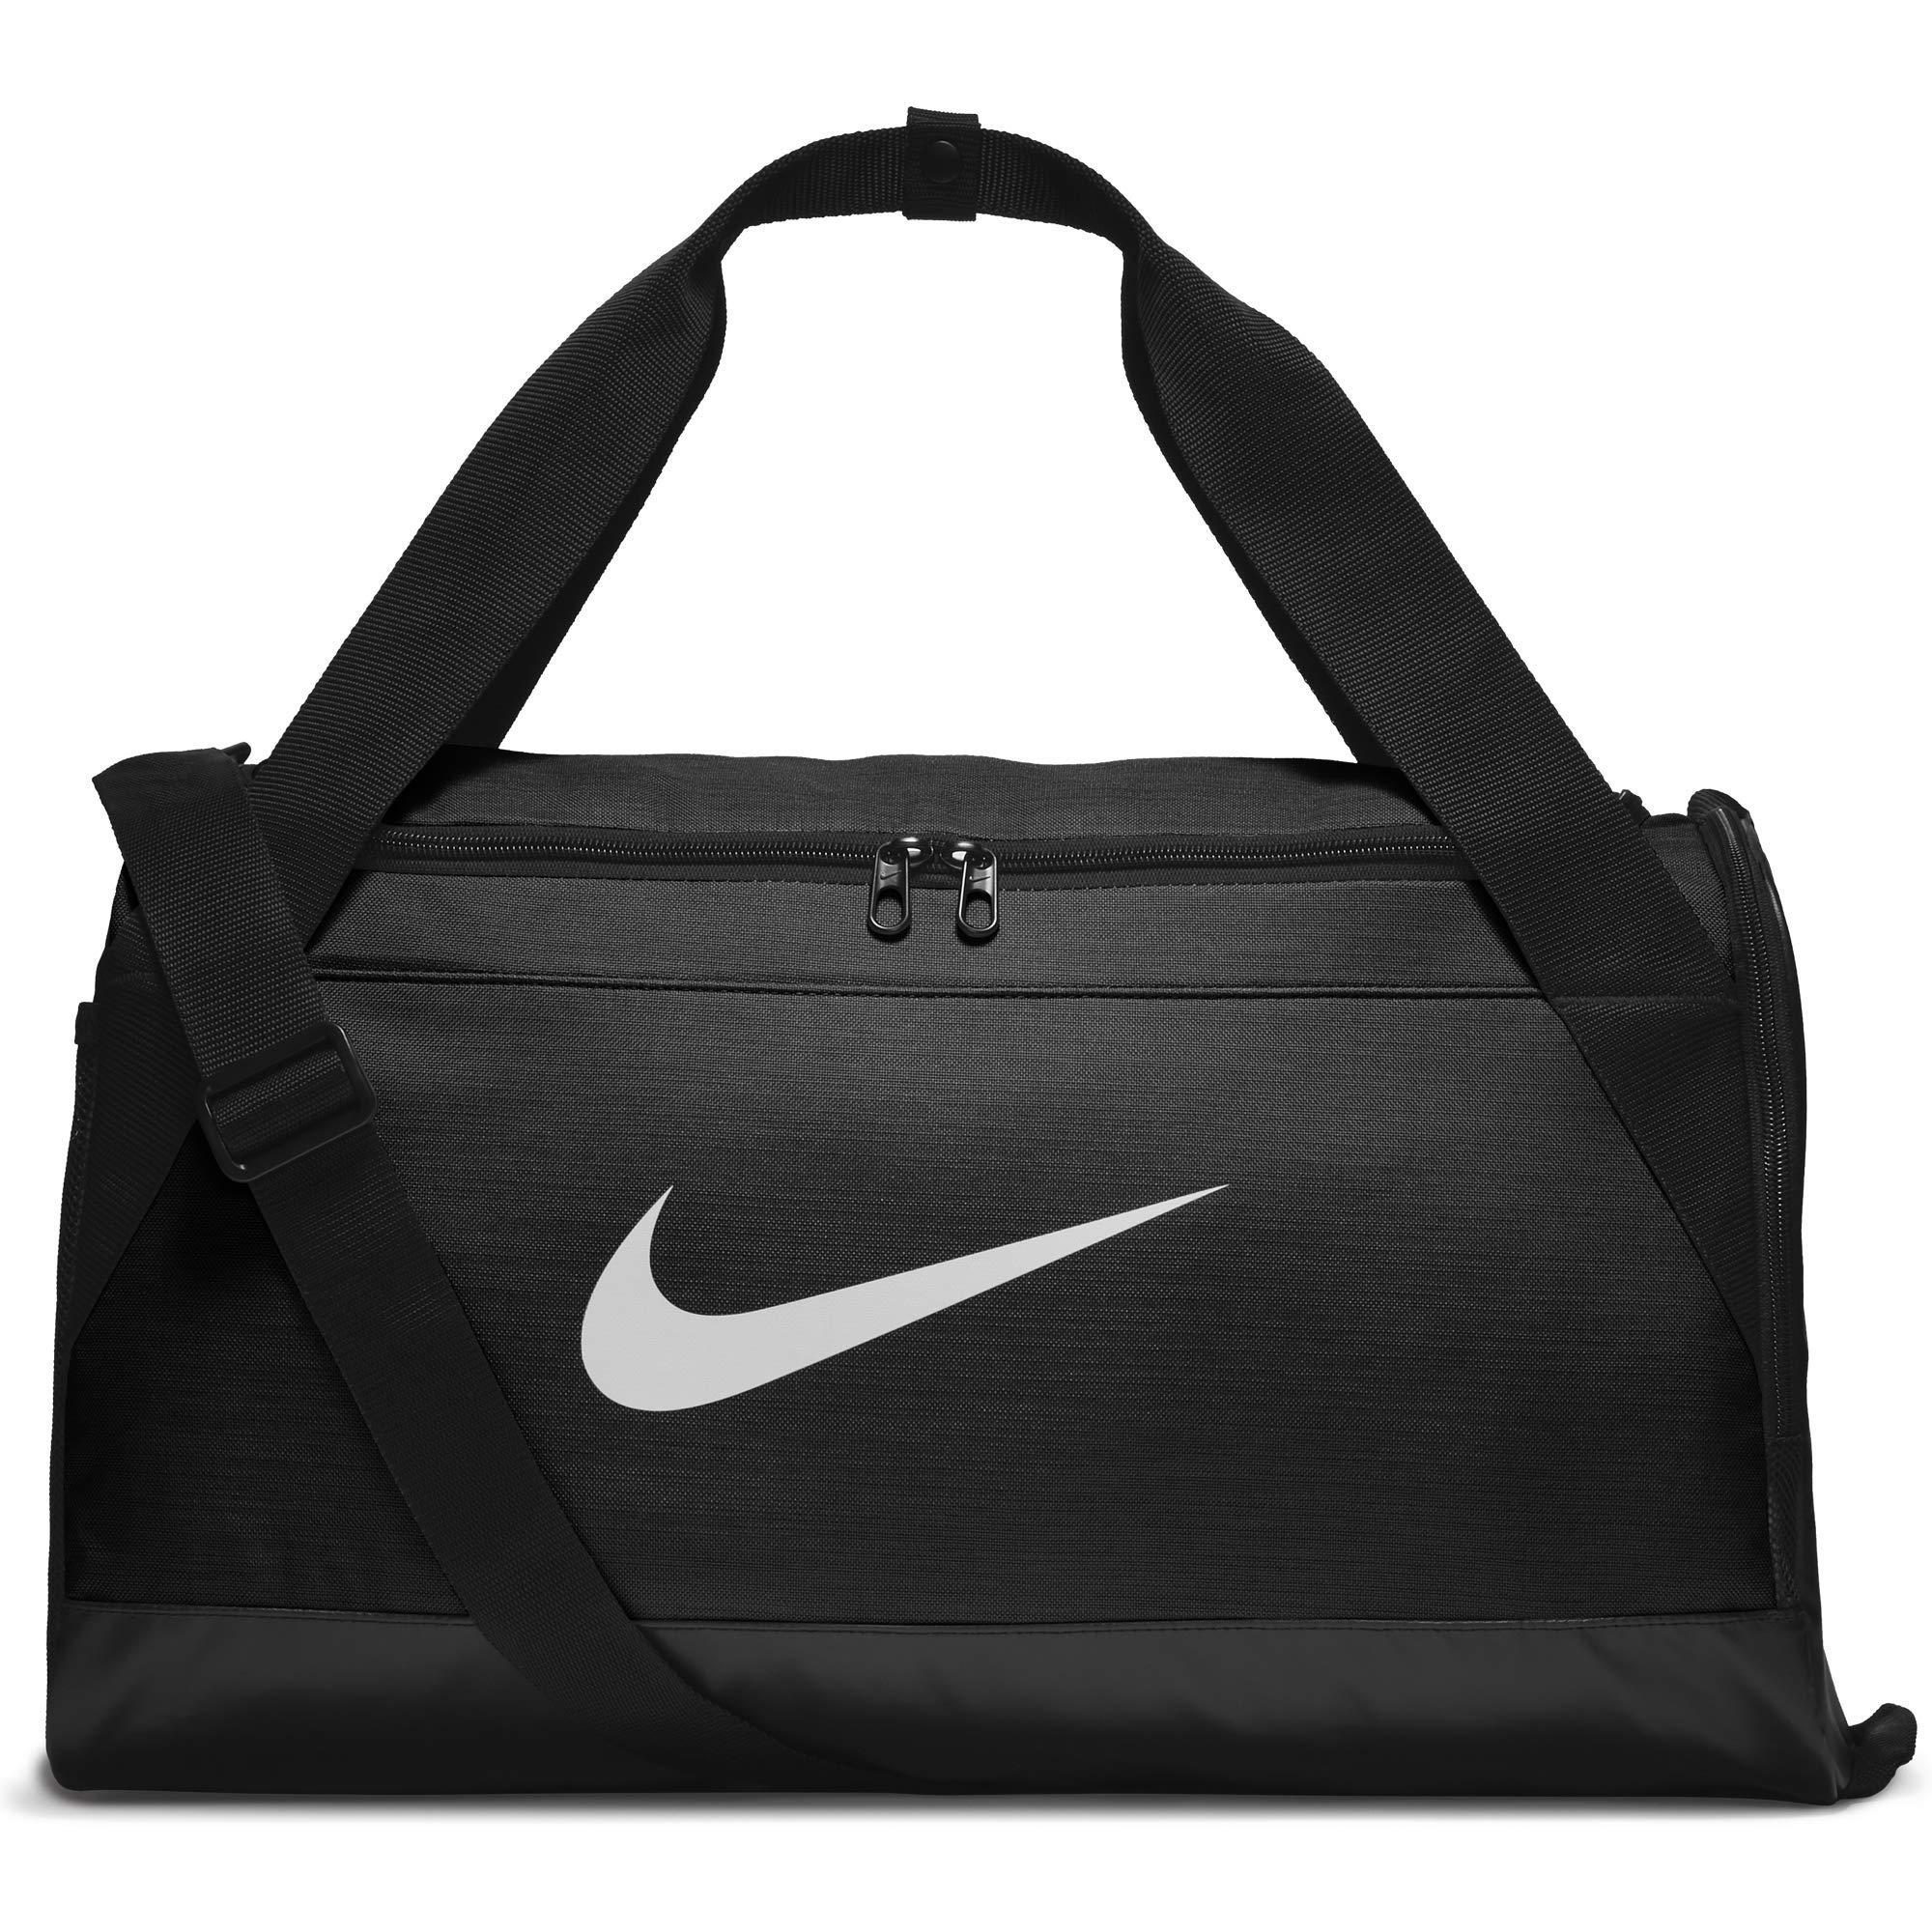 NIKE Brasilia Training Duffel Bag, Black/Black/White, Small